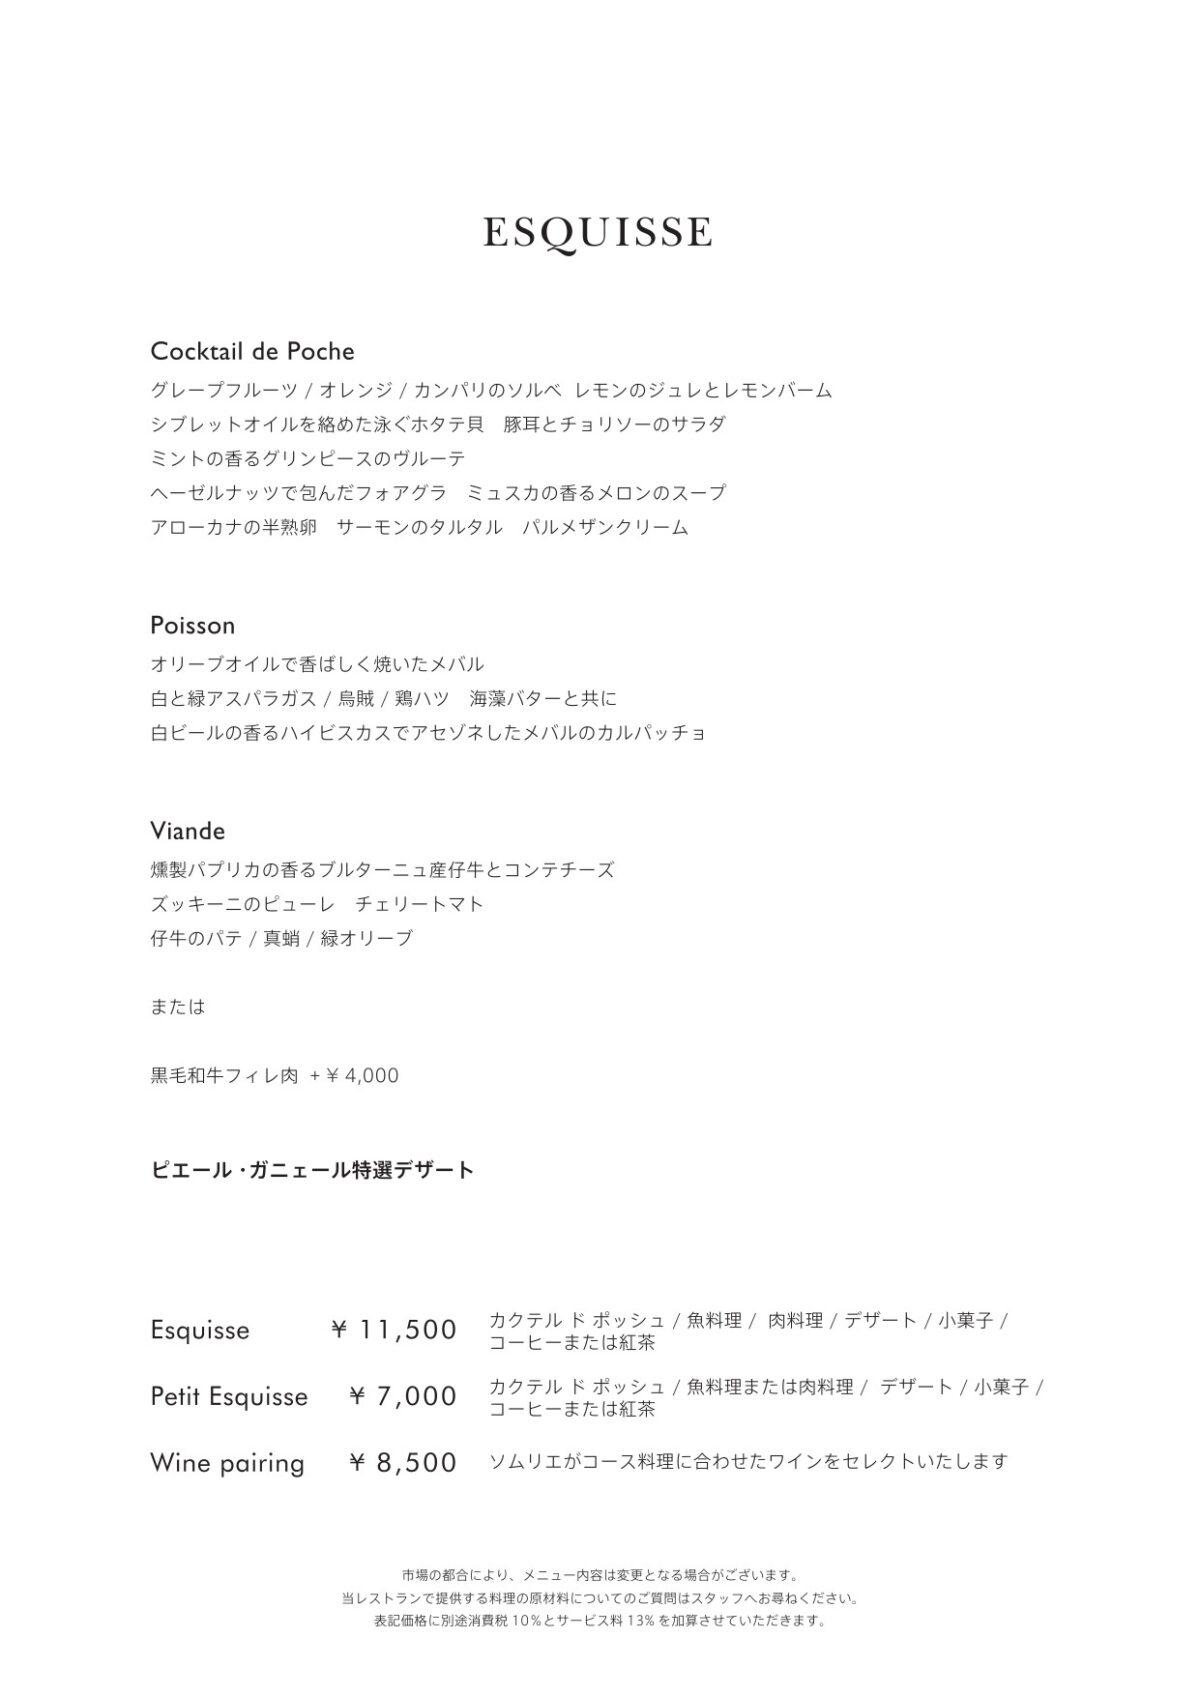 ANAインターコンチネンタルホテル東京ピエール・ガニェールランチ